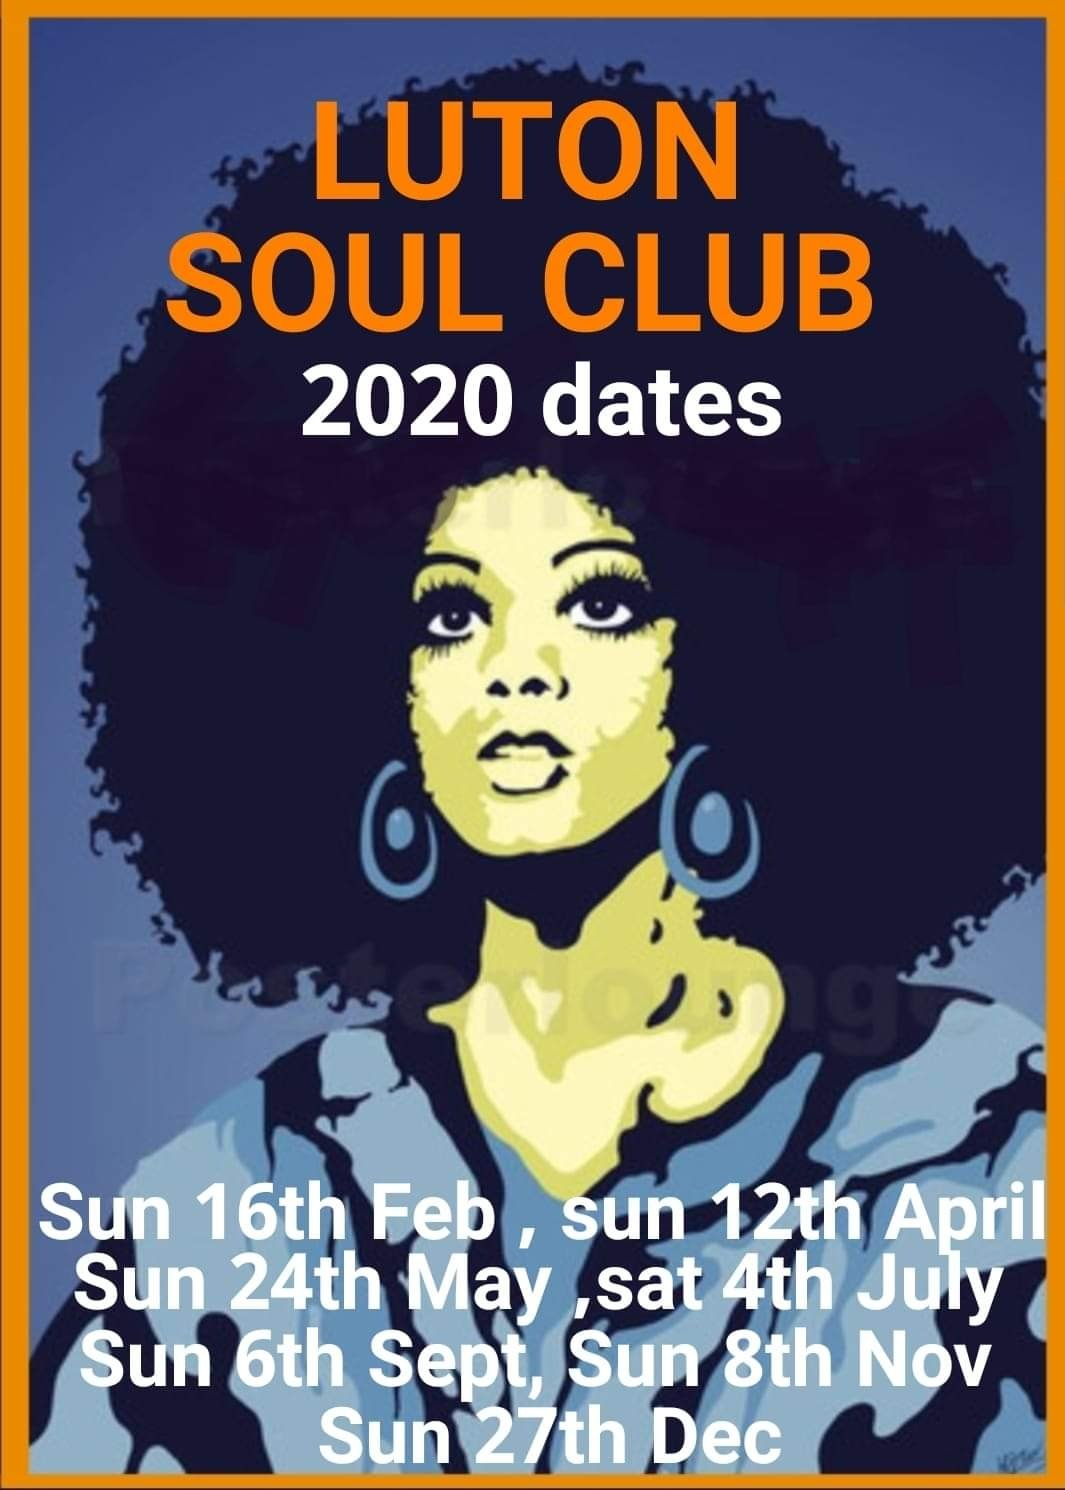 Luton Soul Club Easter Sunday Soul Social flyer